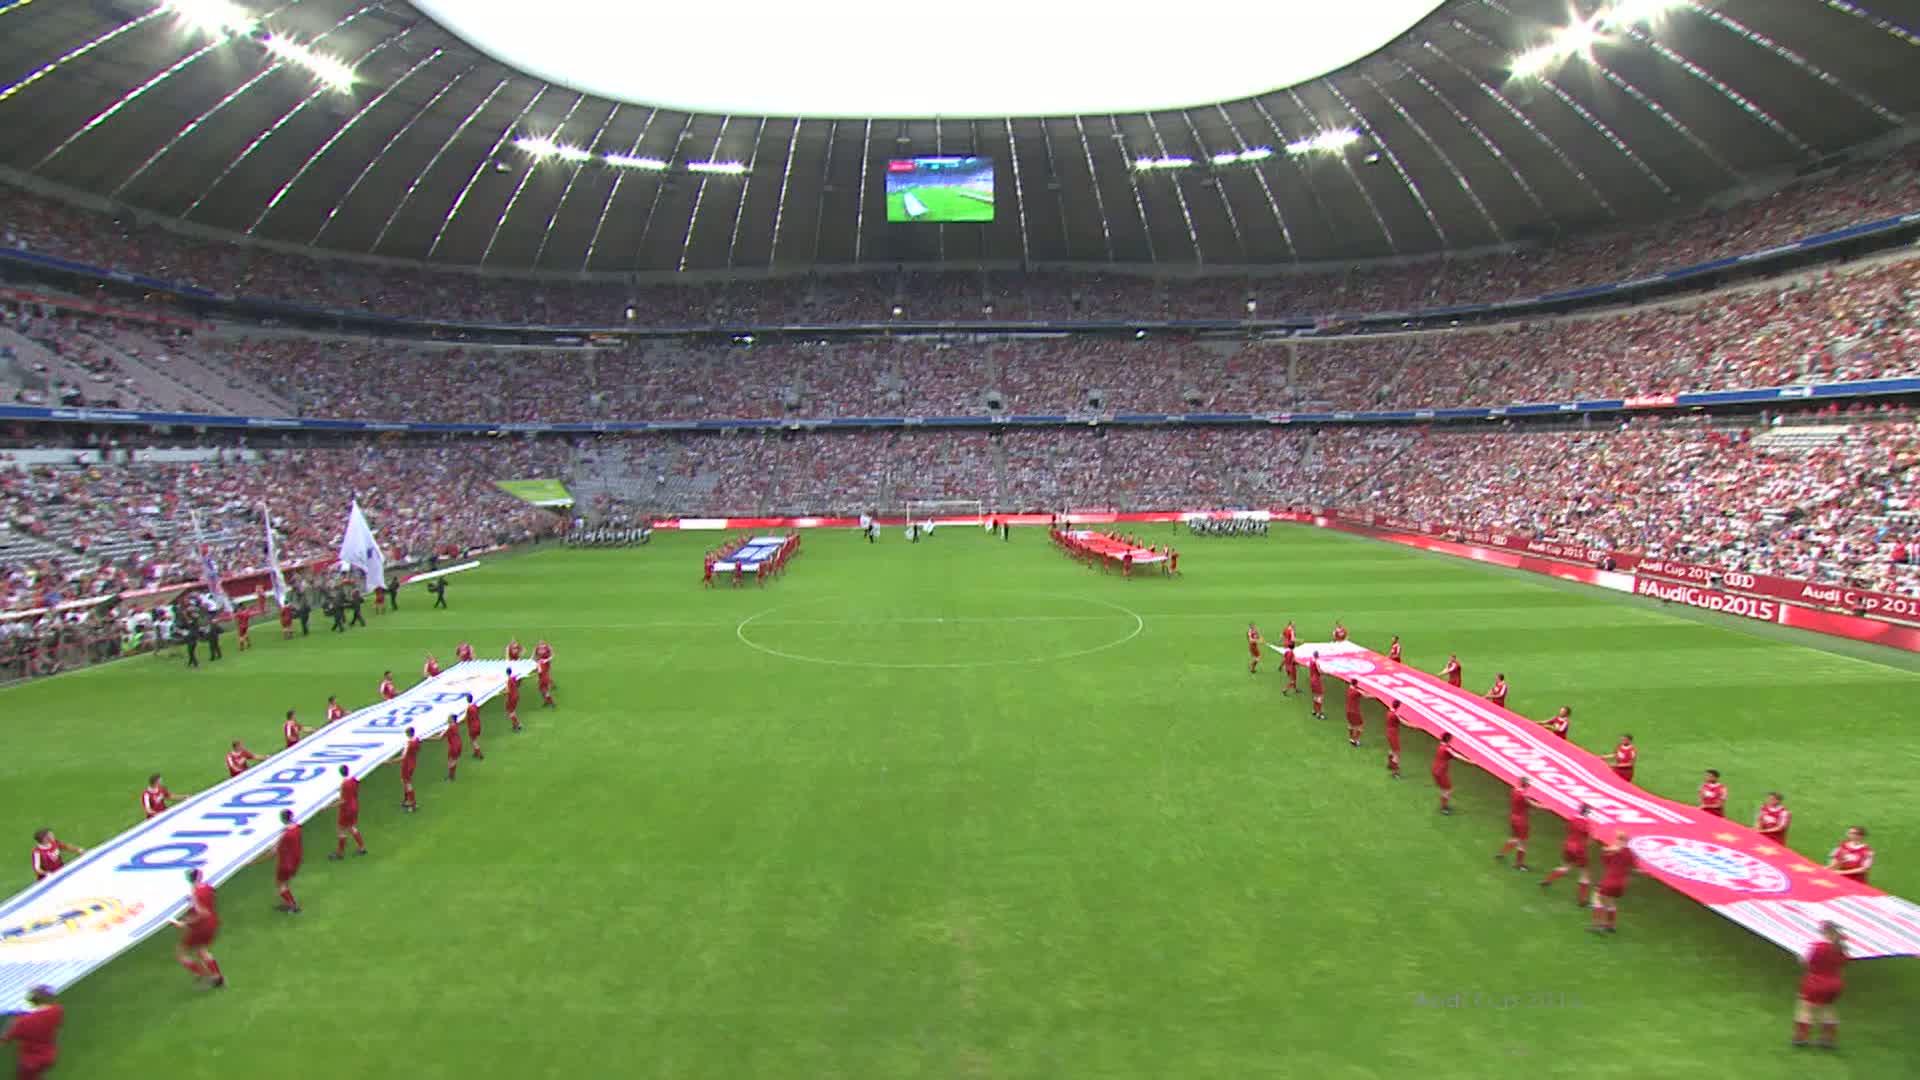 Audi Cup - Real Madrid vs. Tottenham Hotspur